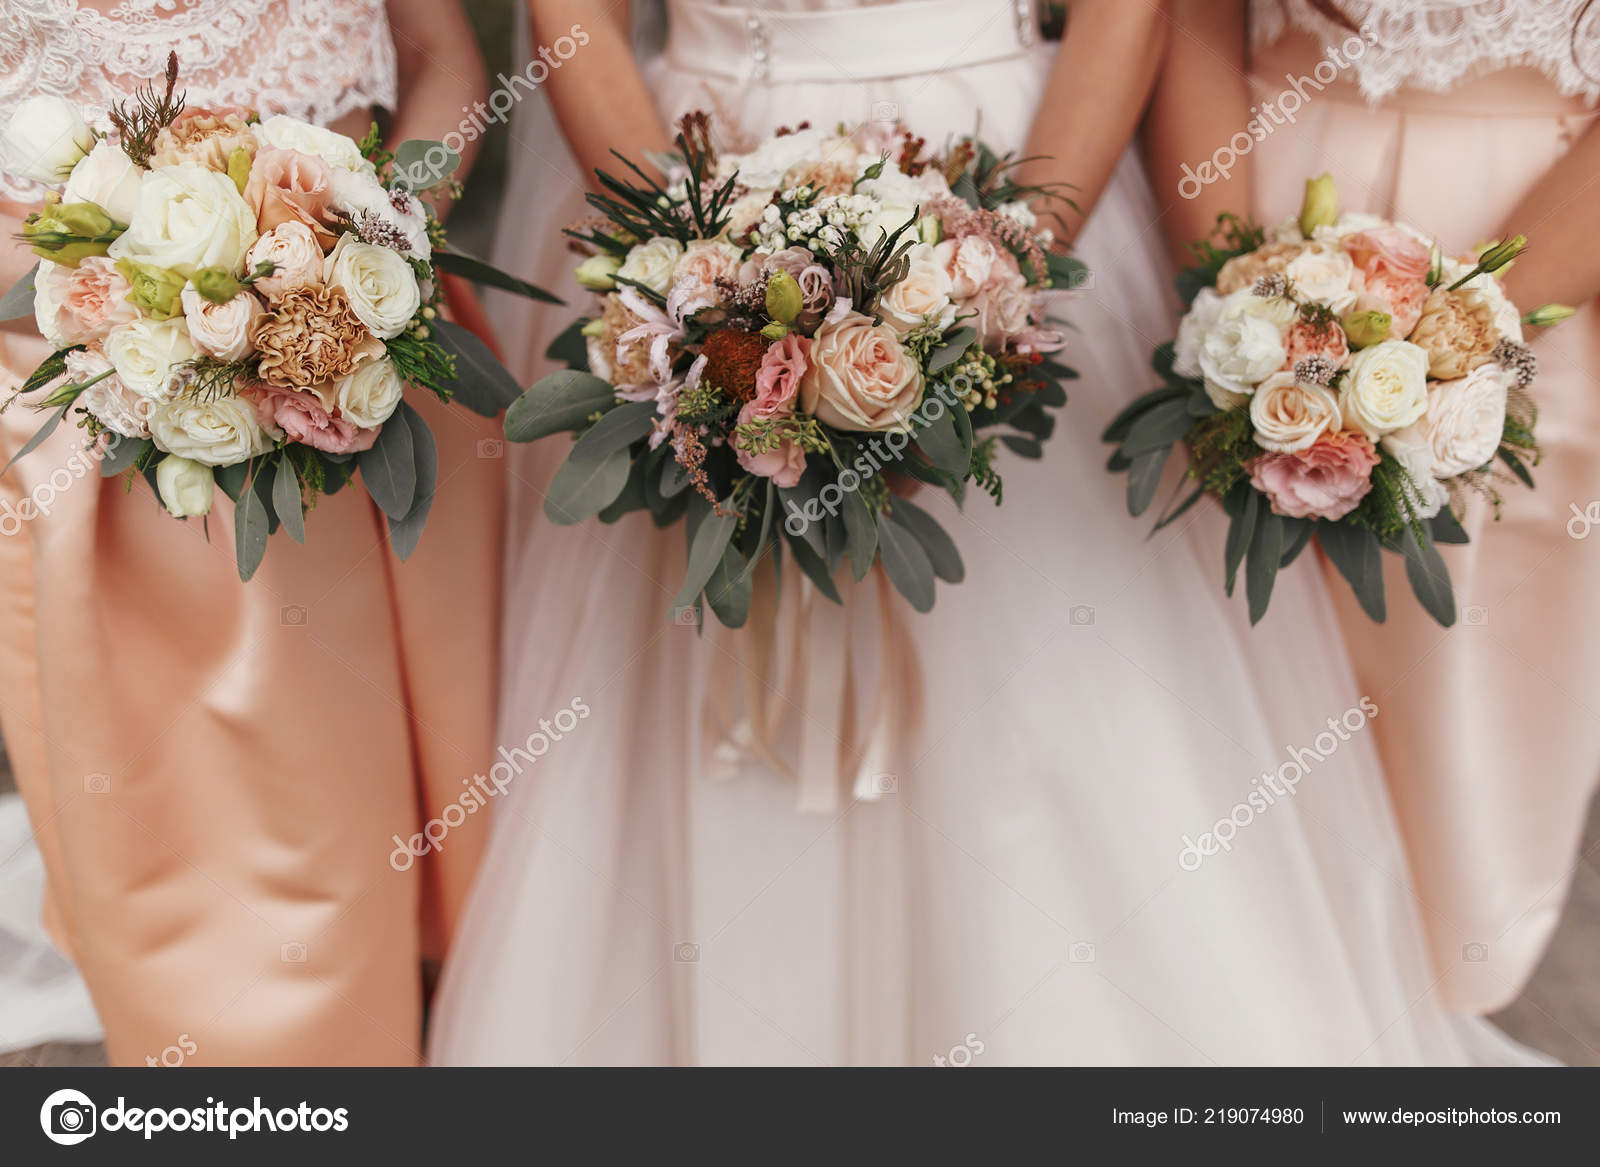 Bouquet Sposa Moderni.Gorgeous Bride Beautiful Bridesmaids Holding Stylish Wedding